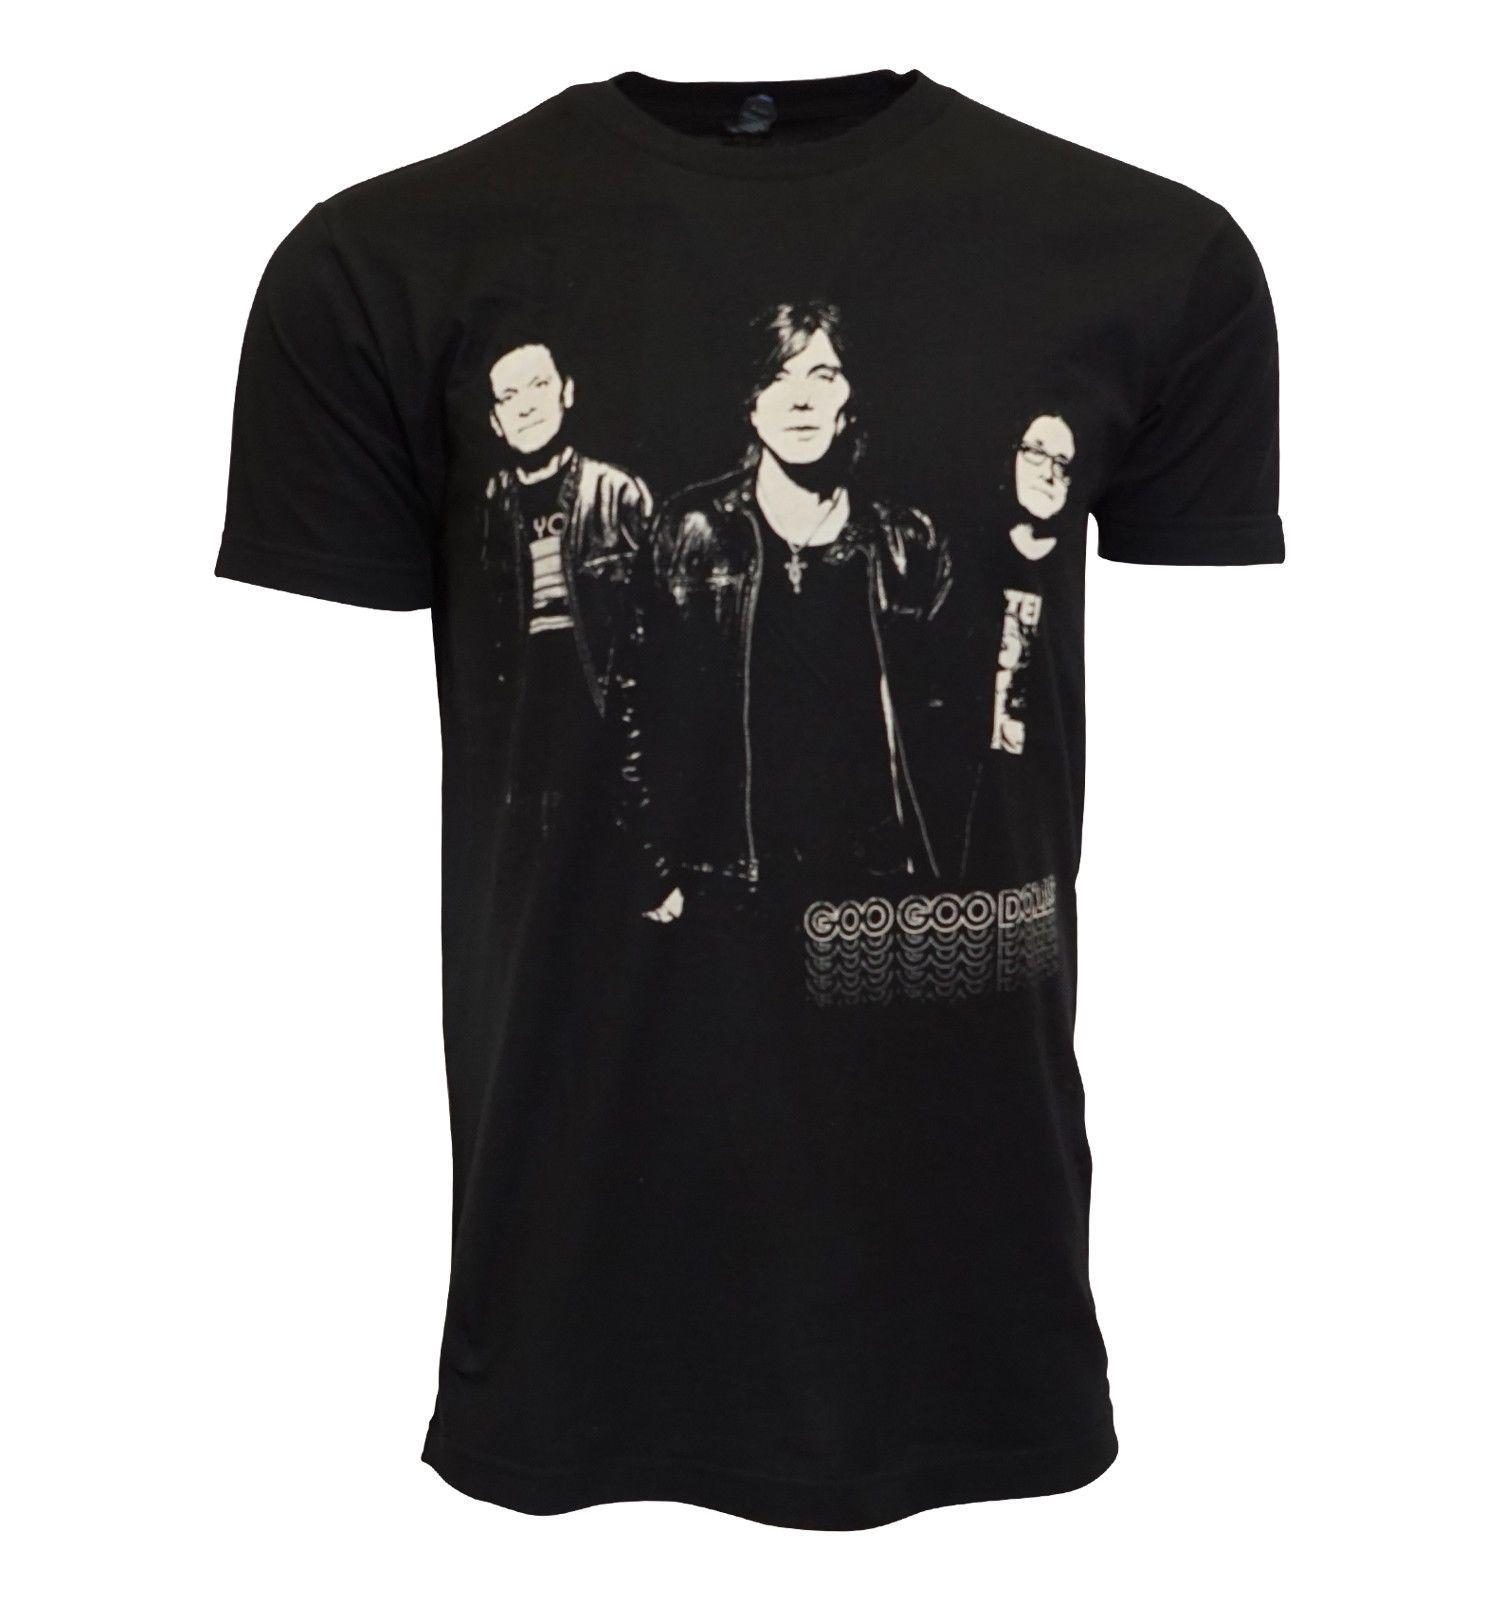 GOO GOO DOLLS SHADOWS PHOTO MEN BLACK T SHIRT Funniest T Shirts Mens Funny  T Shirts From Foryouboutique, $11.01  DHgate.Com